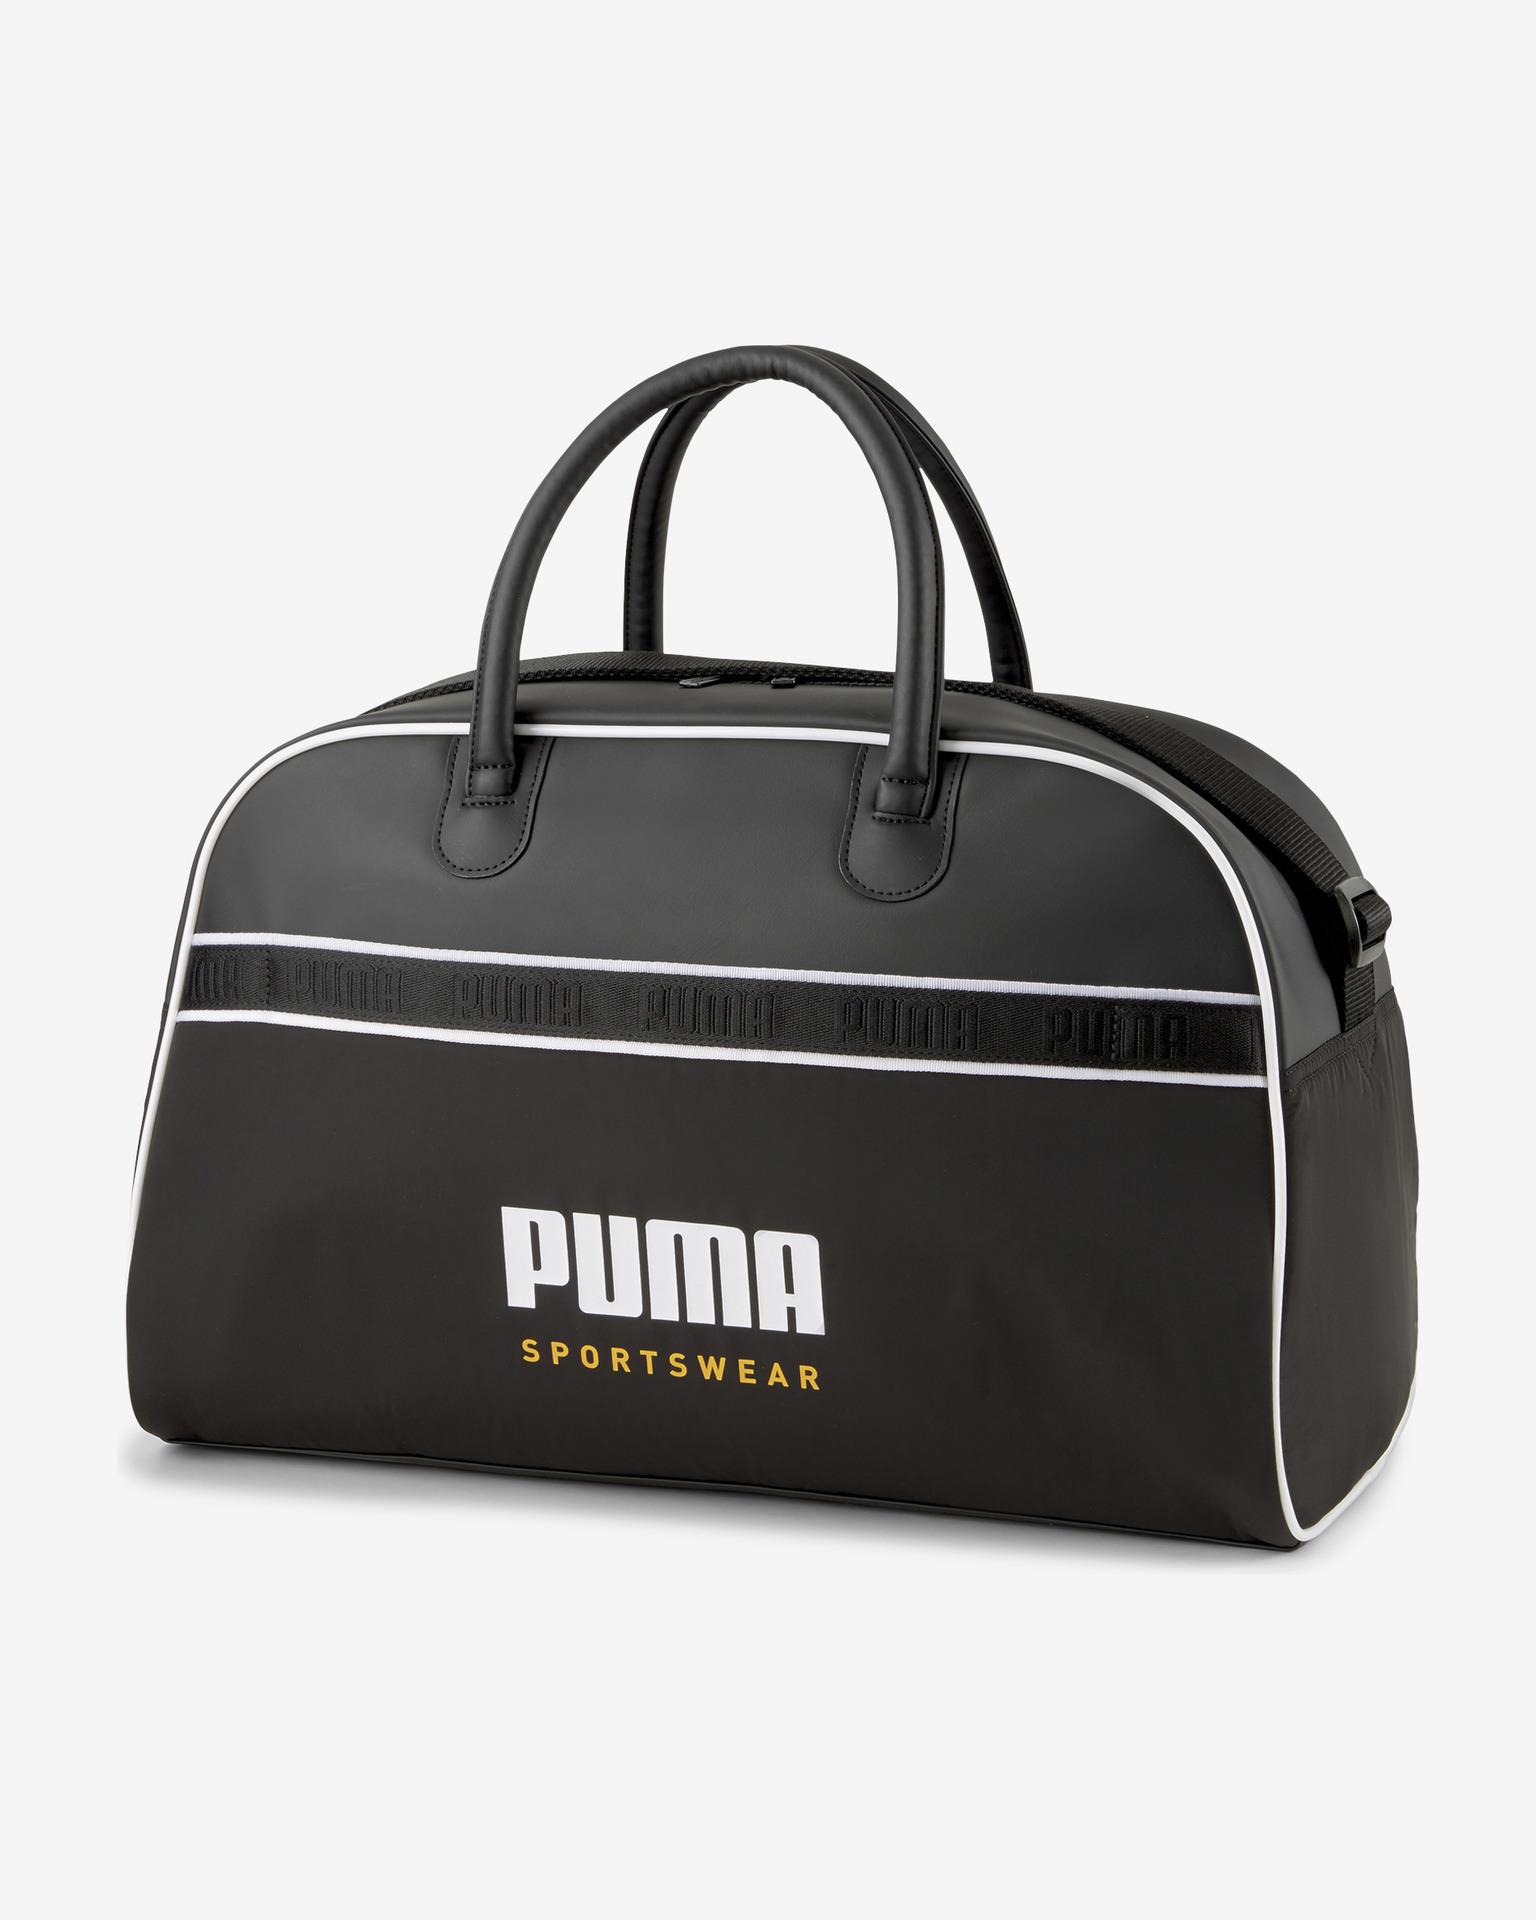 Puma Borsa donna nero  Grib